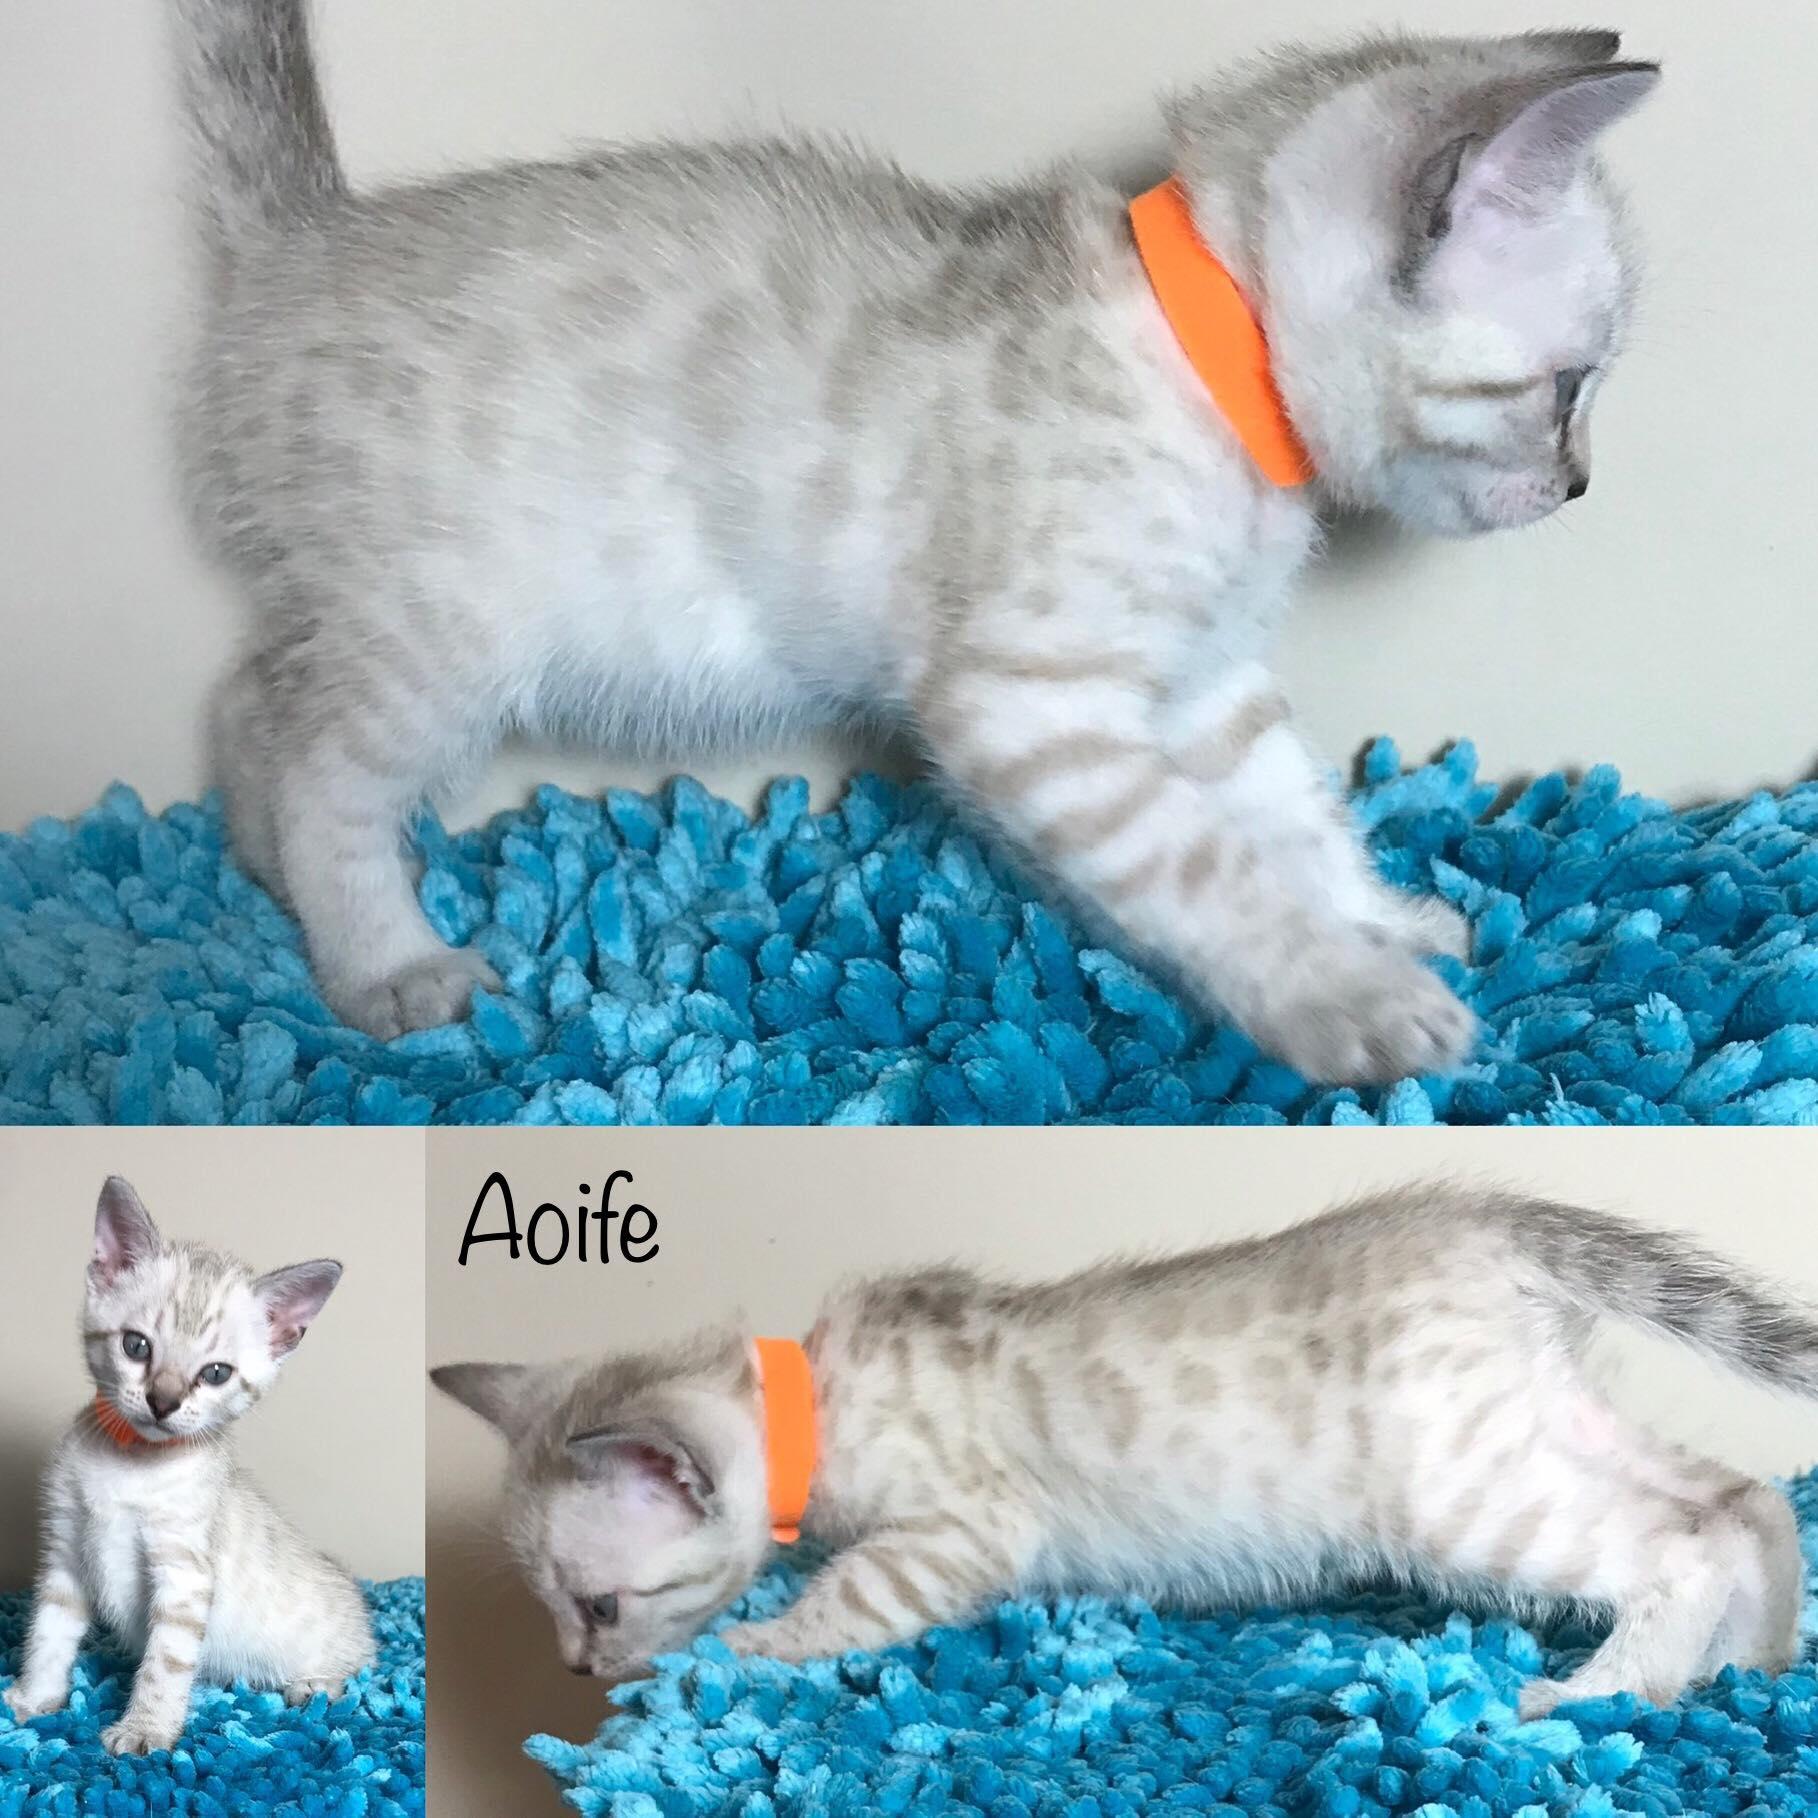 Aoife 5 weeks